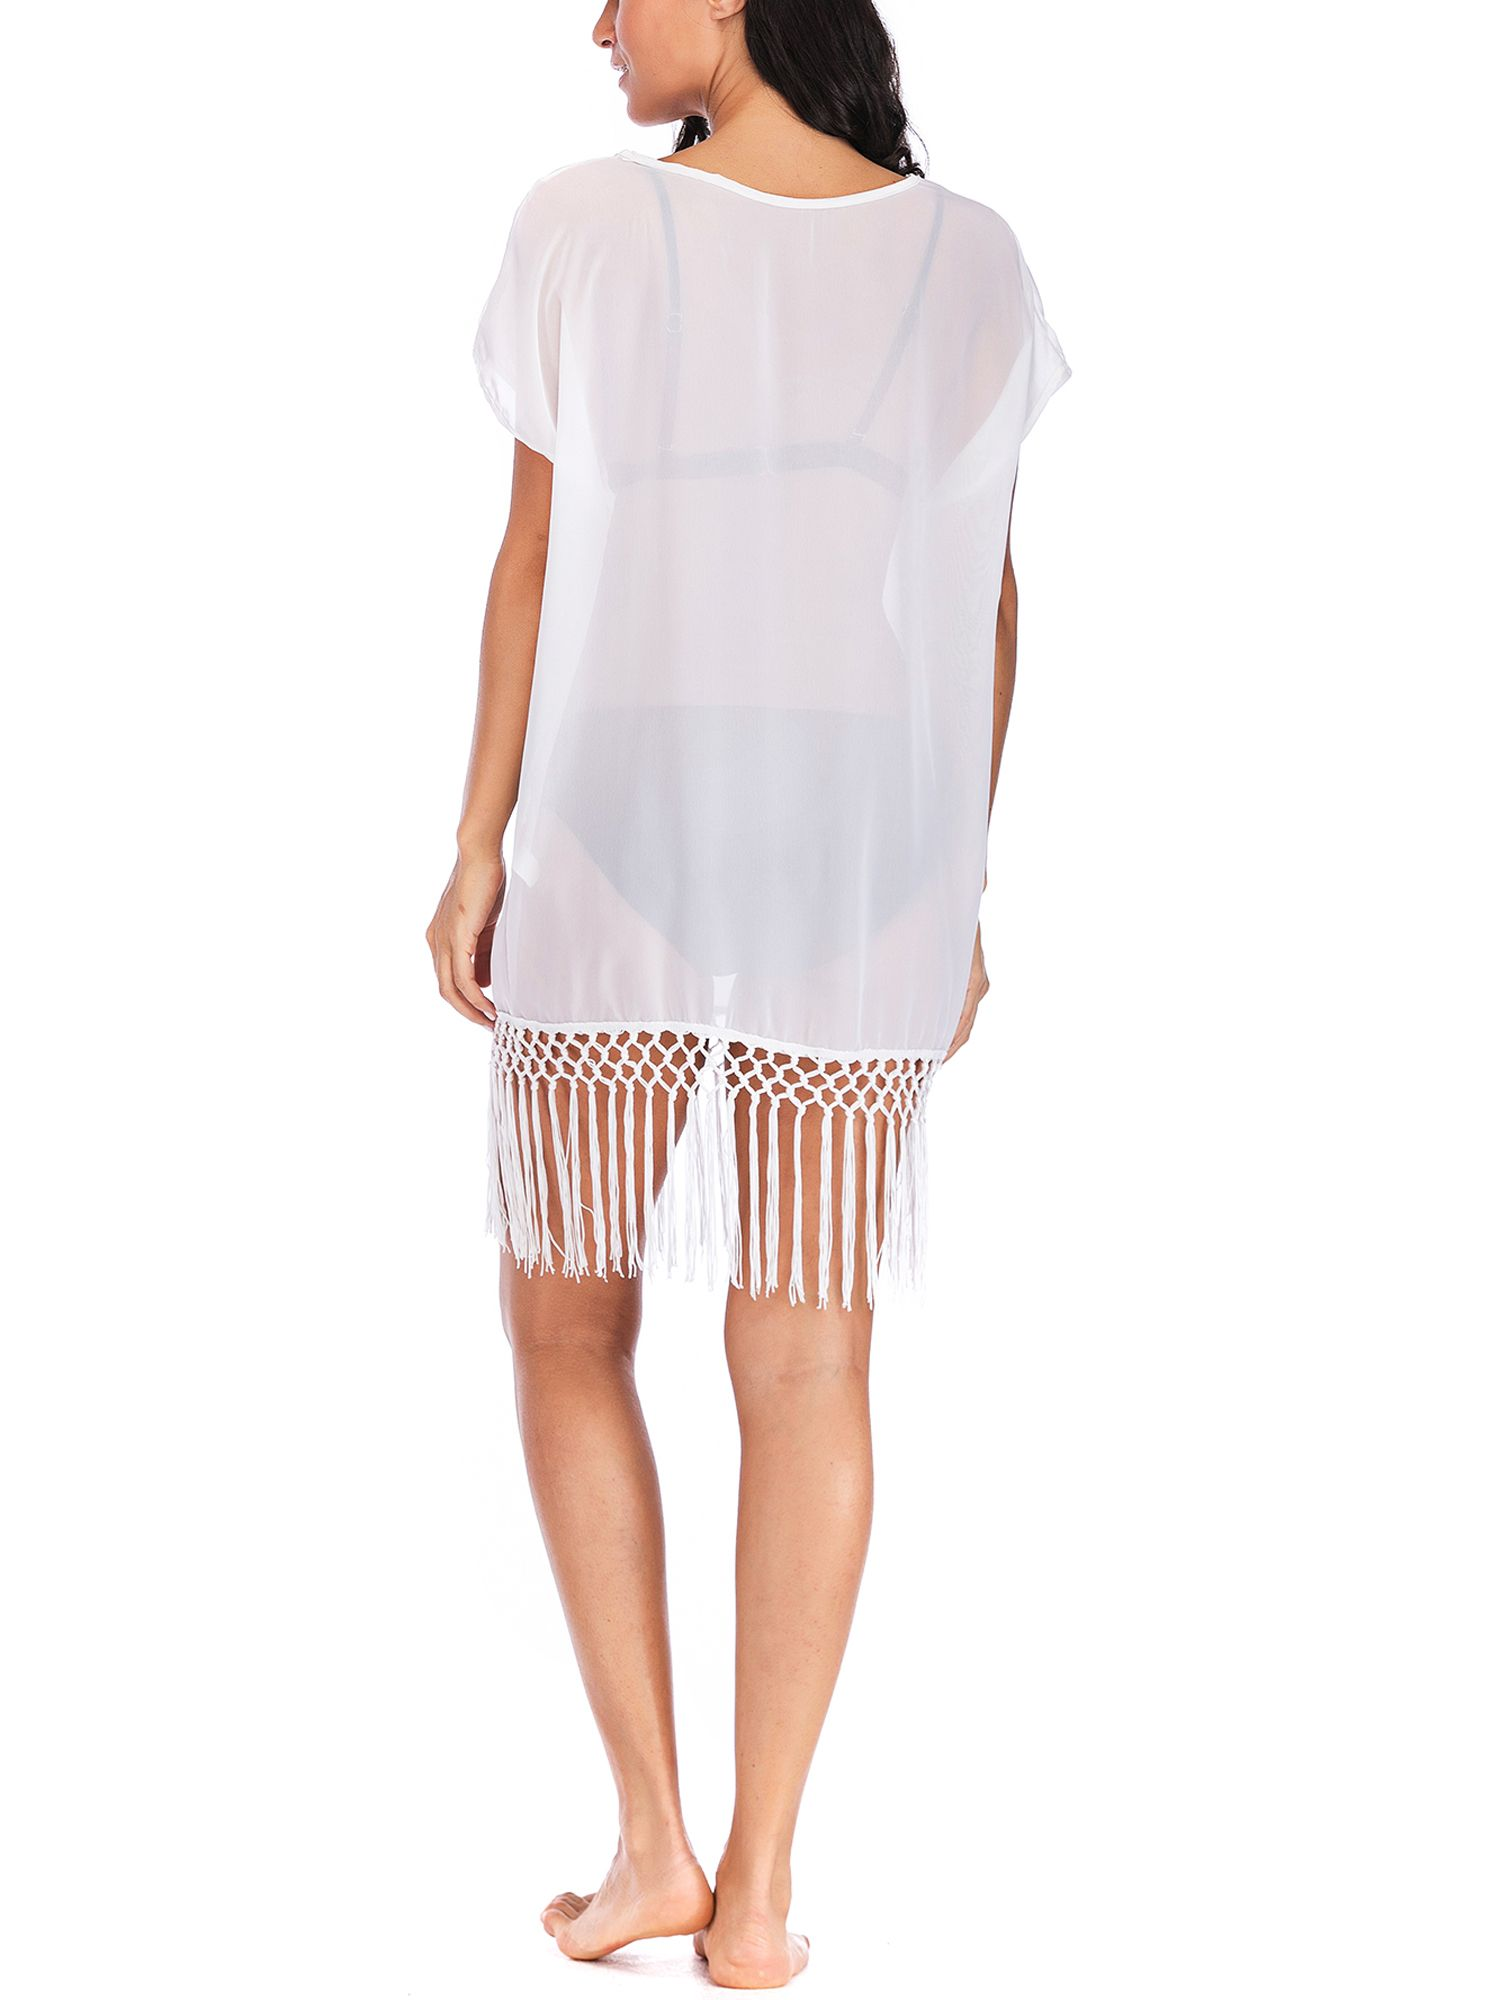 ded917fa8a LELINTA Women Swimwear Lounge Dress Bikini Tops Cover ups Lady Swimsuit  Chiffon Beach Shirt Dress Bathing Suit Loose Beach Coverups#Tops, #Bikini, # ups